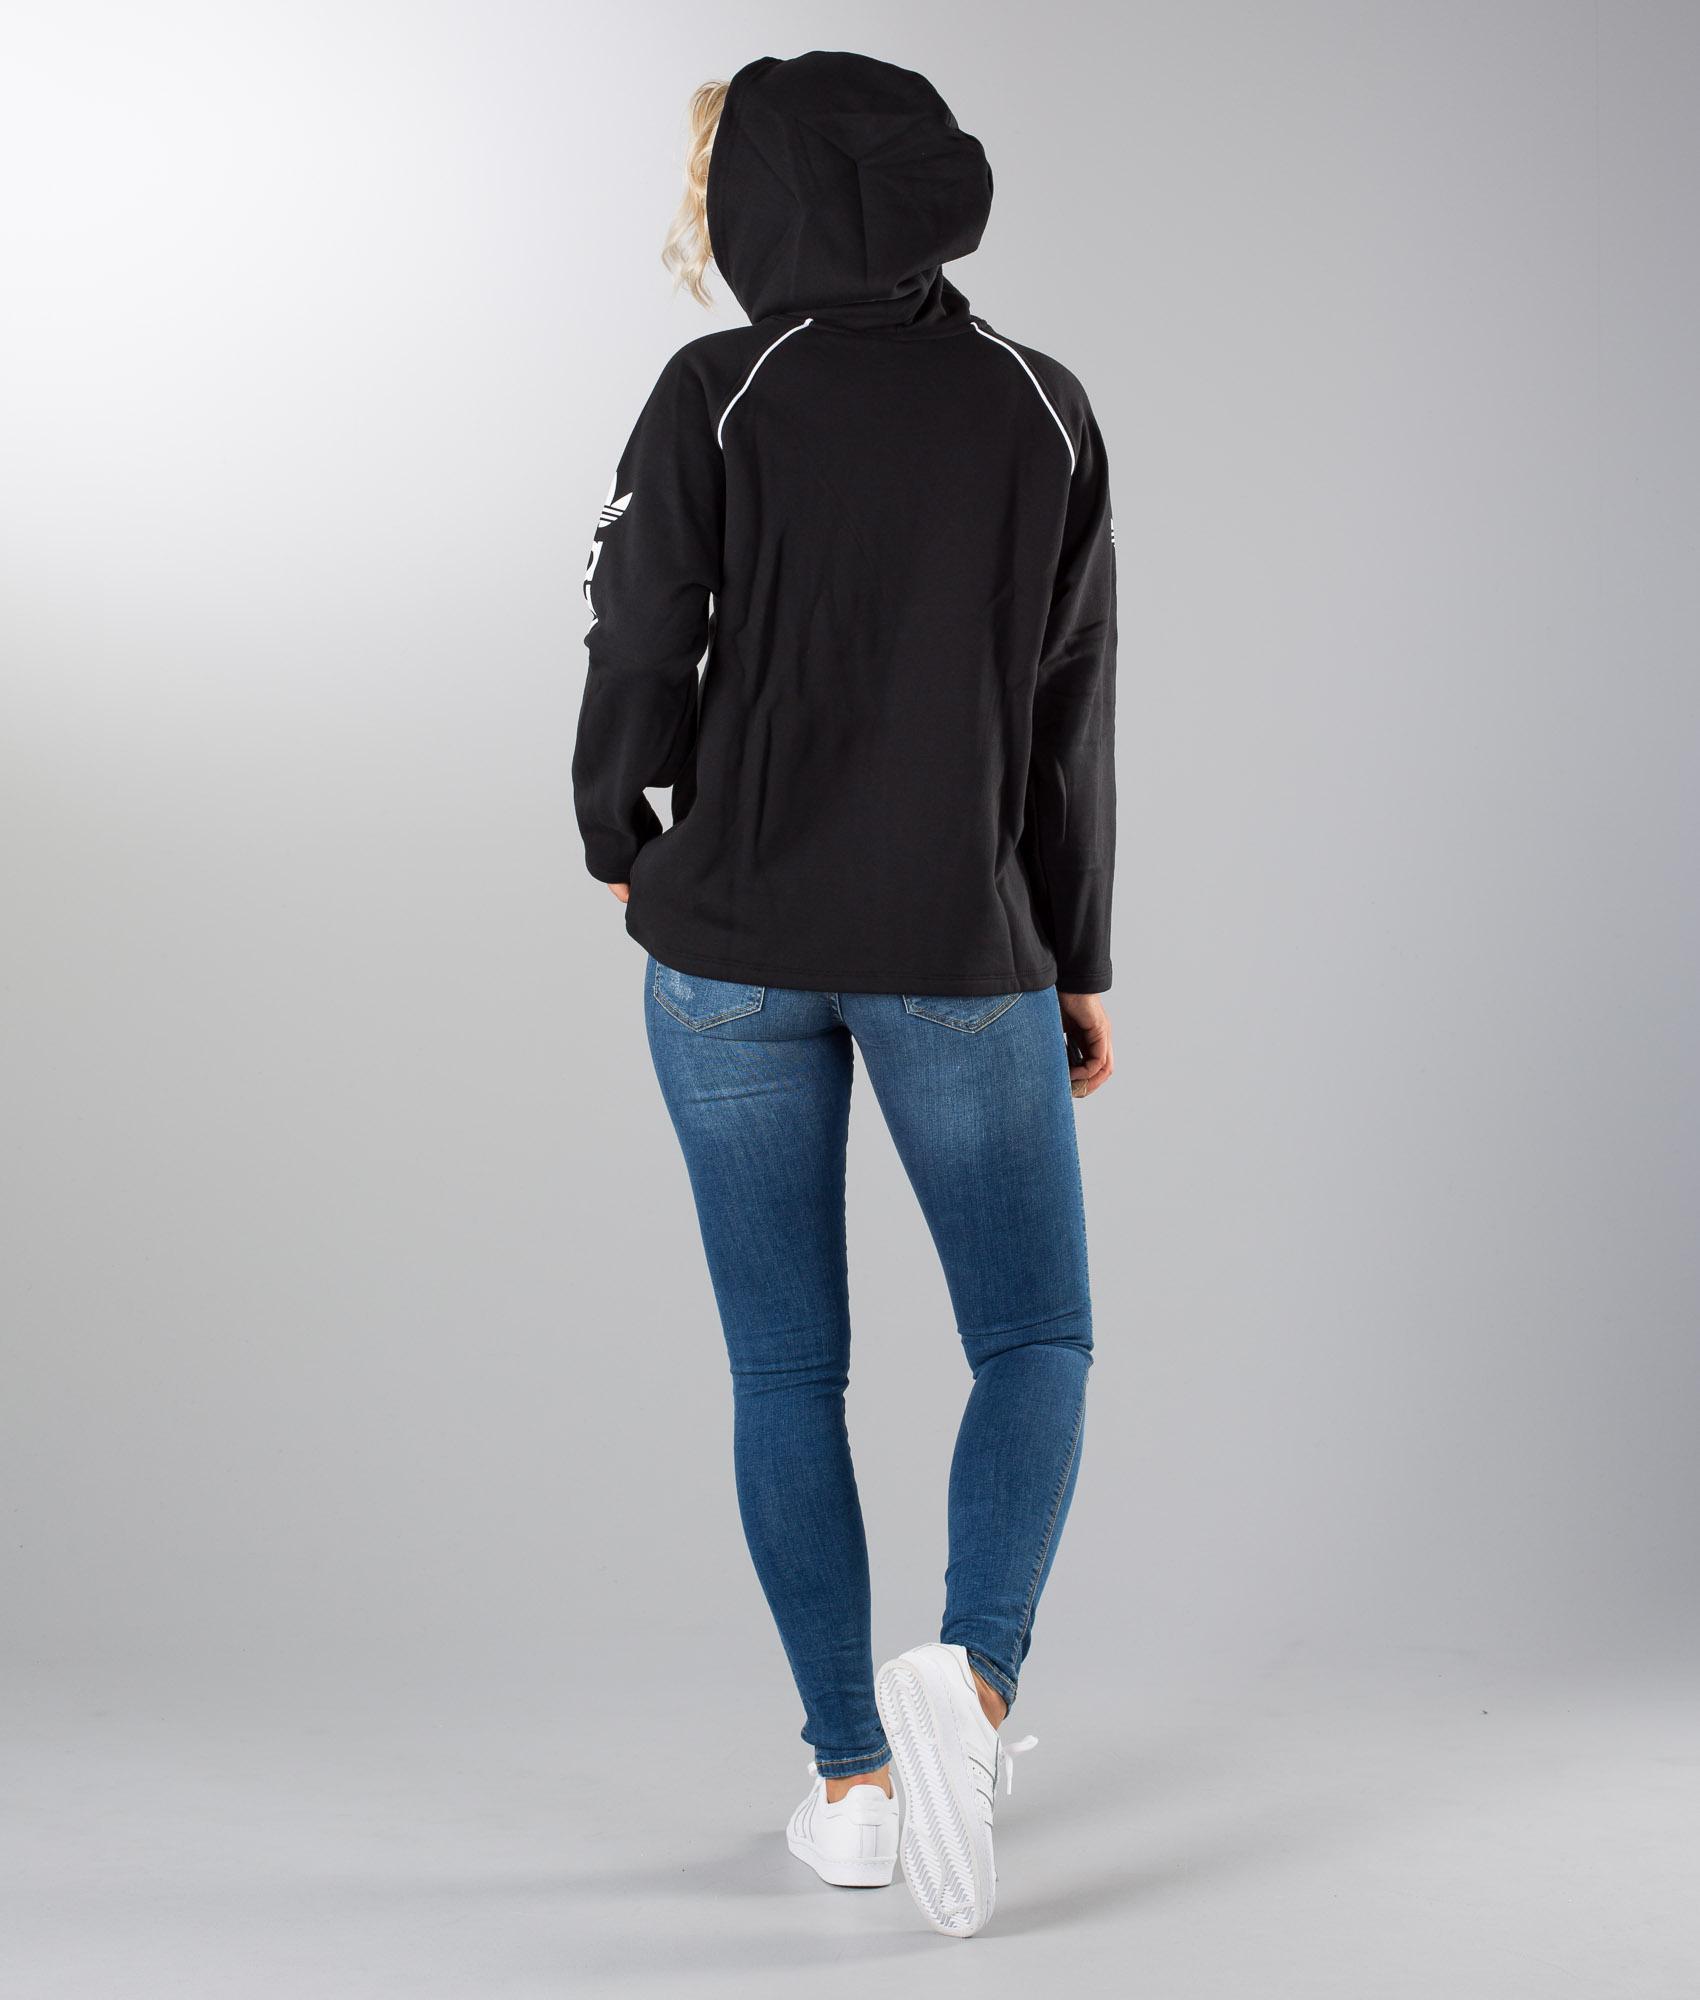 Cappuccio Black Adidas Felpa it Originals Ridestore Con Hoodie A8qwqI